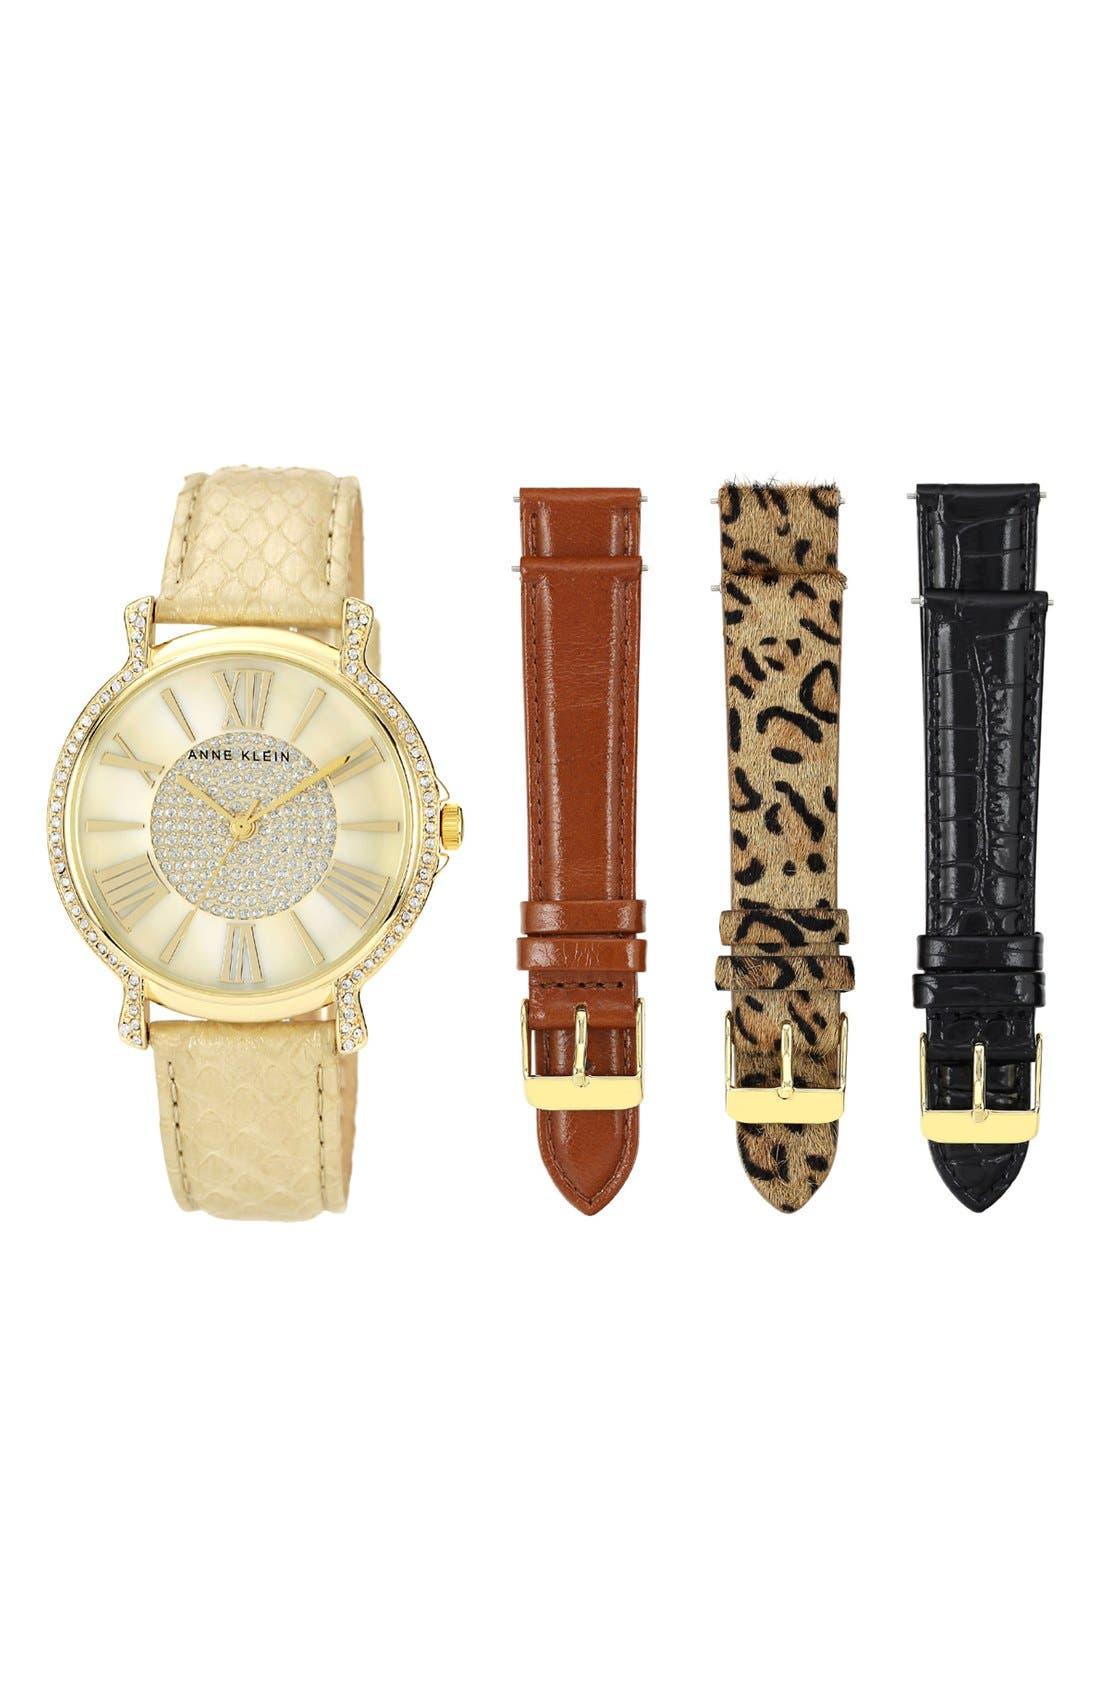 Main Image - Anne Klein Round Watch & Leather Strap Boxed Set